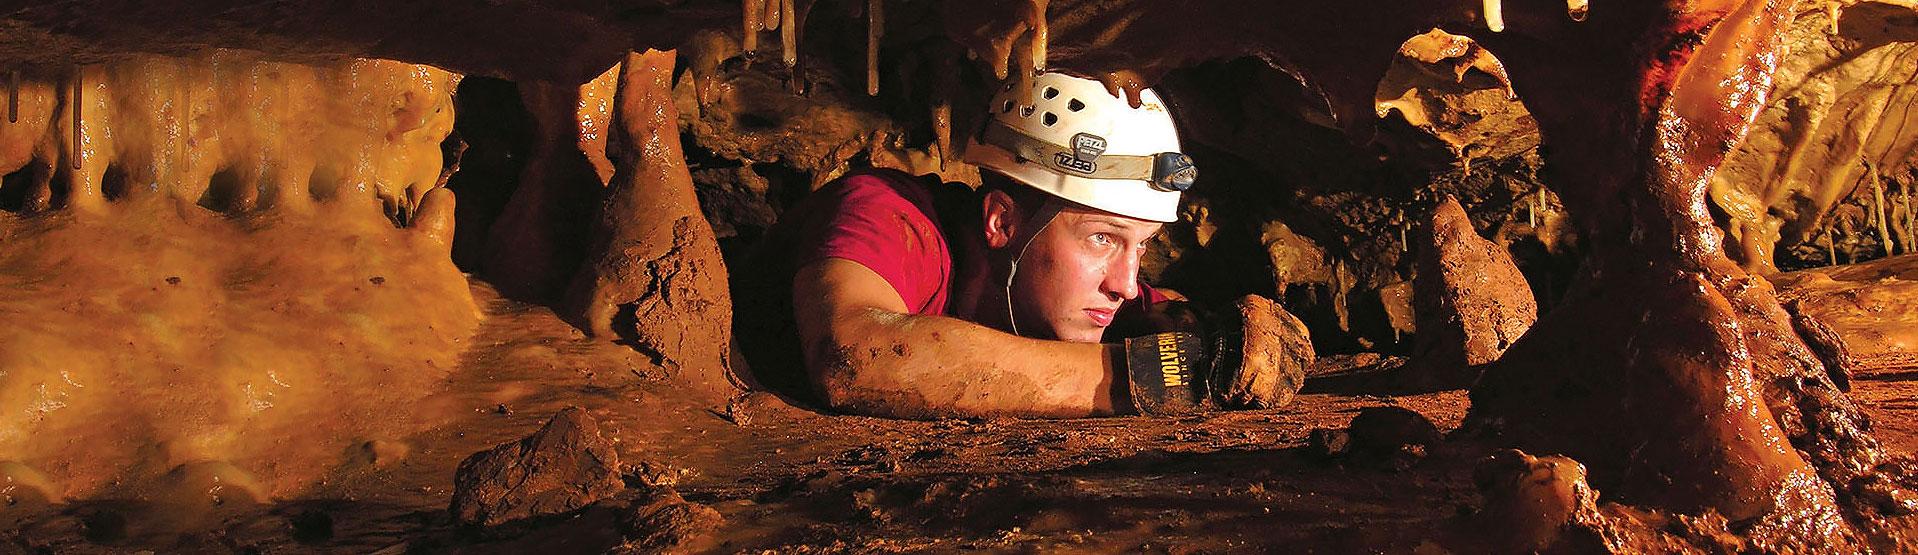 Man Exploring Cave